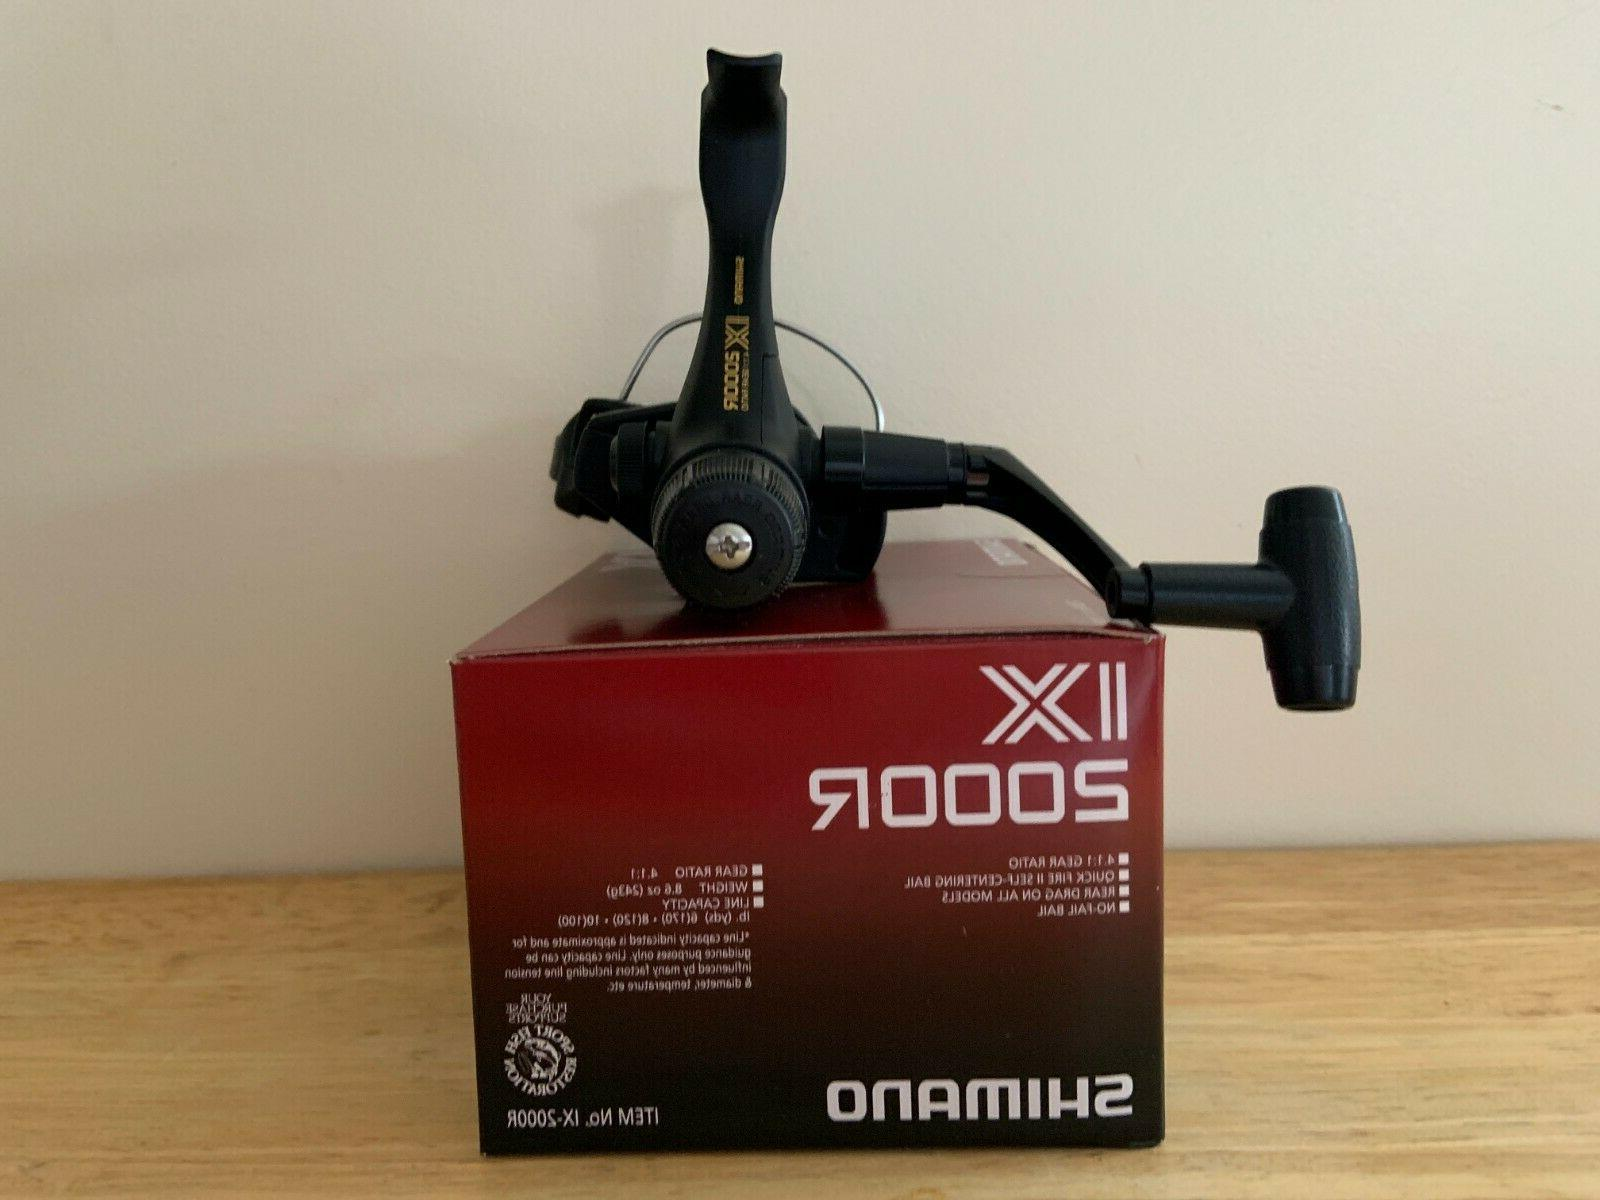 Shimano IX 2000R reel